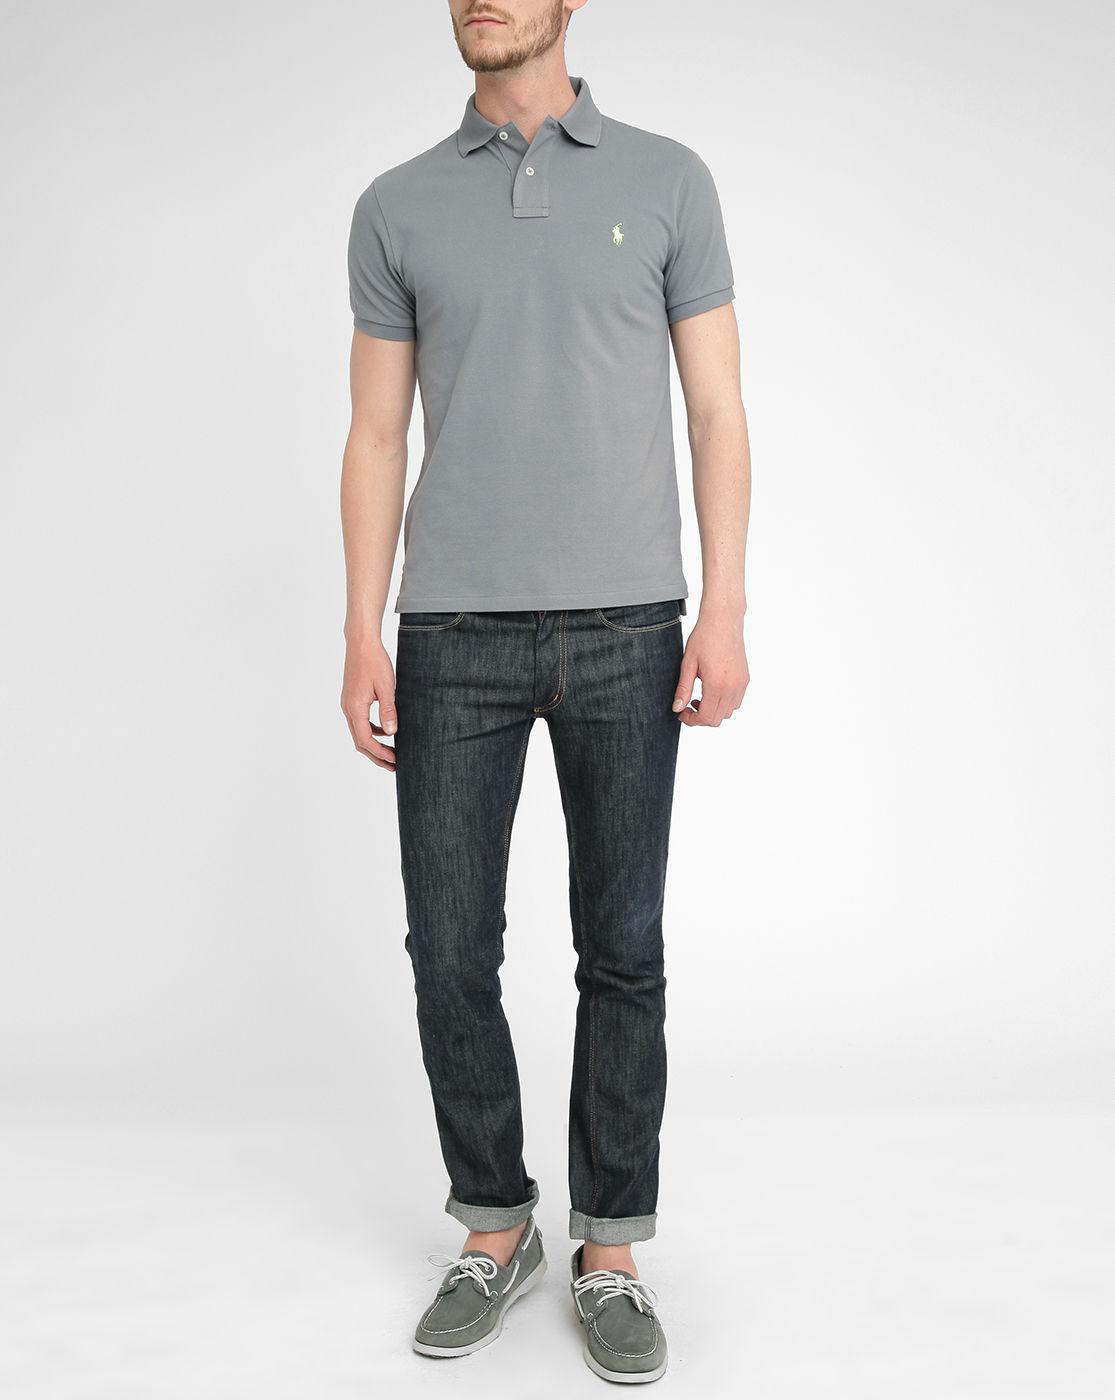 polo ralph lauren grey slim fit polo shirt in blue for men. Black Bedroom Furniture Sets. Home Design Ideas